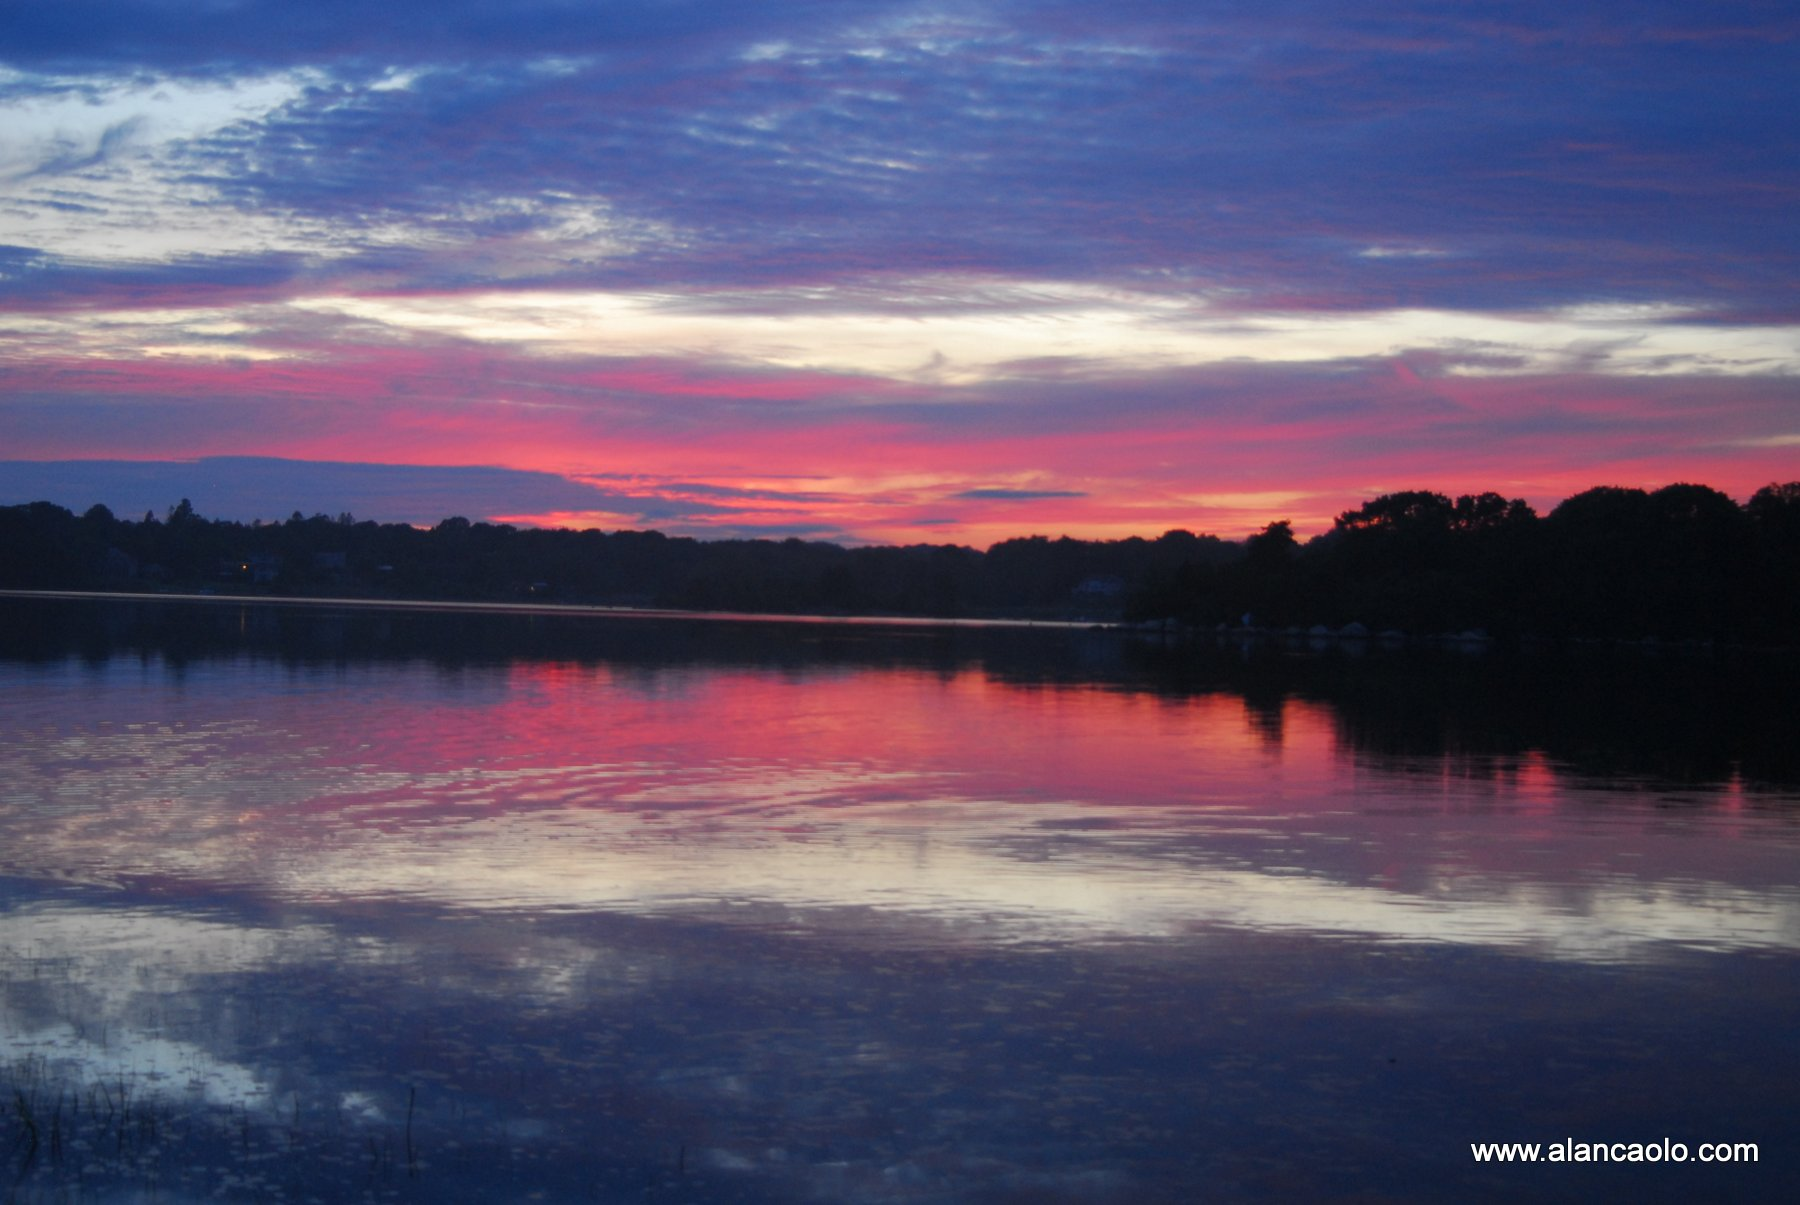 sunrise photography © 2020 alan caolo